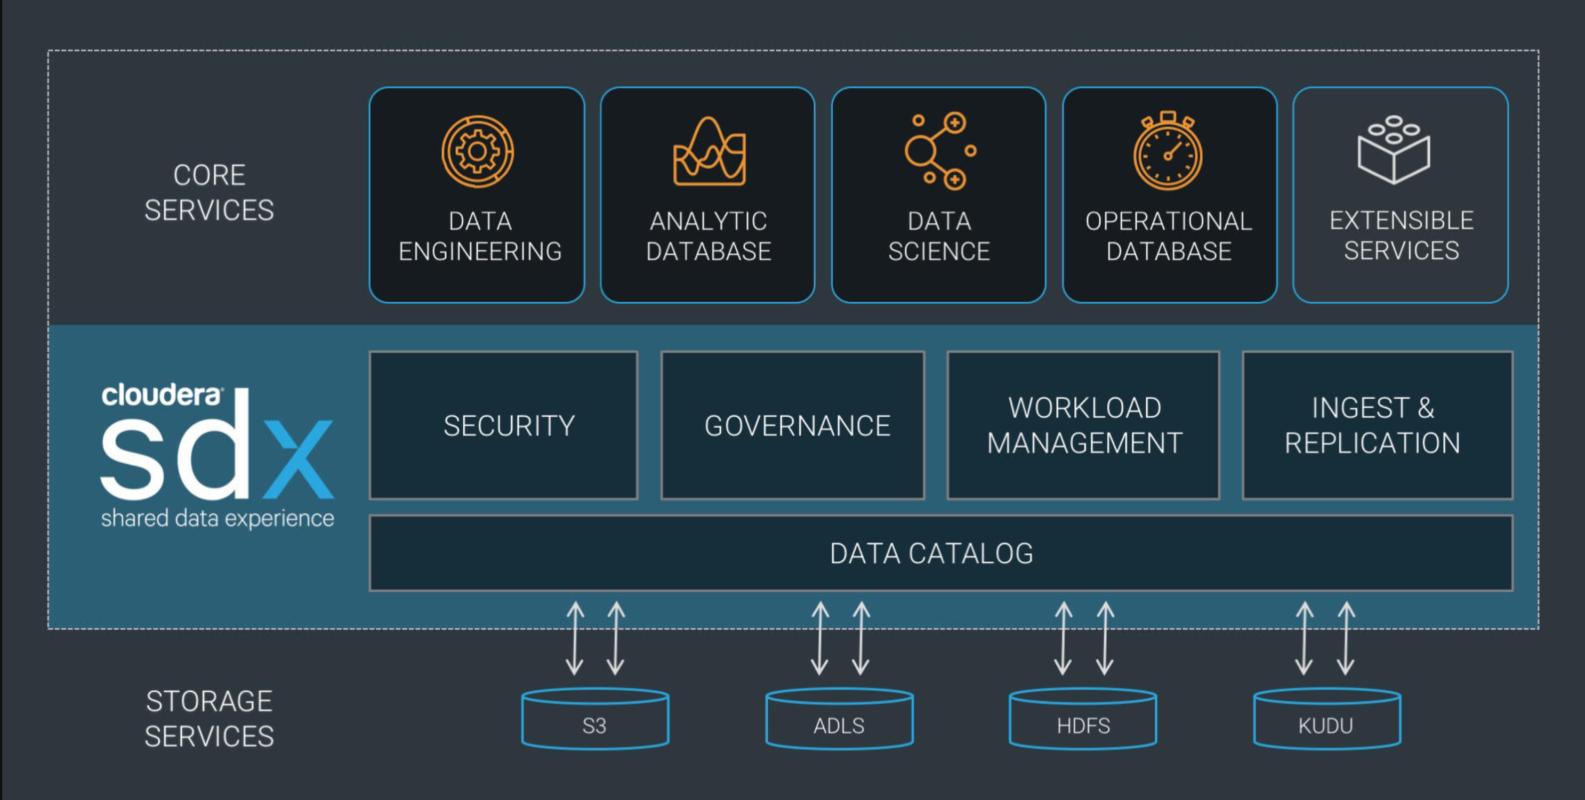 cloud, Cloudera SDX per la gestione condivisa dei dati enterprise nel cloud